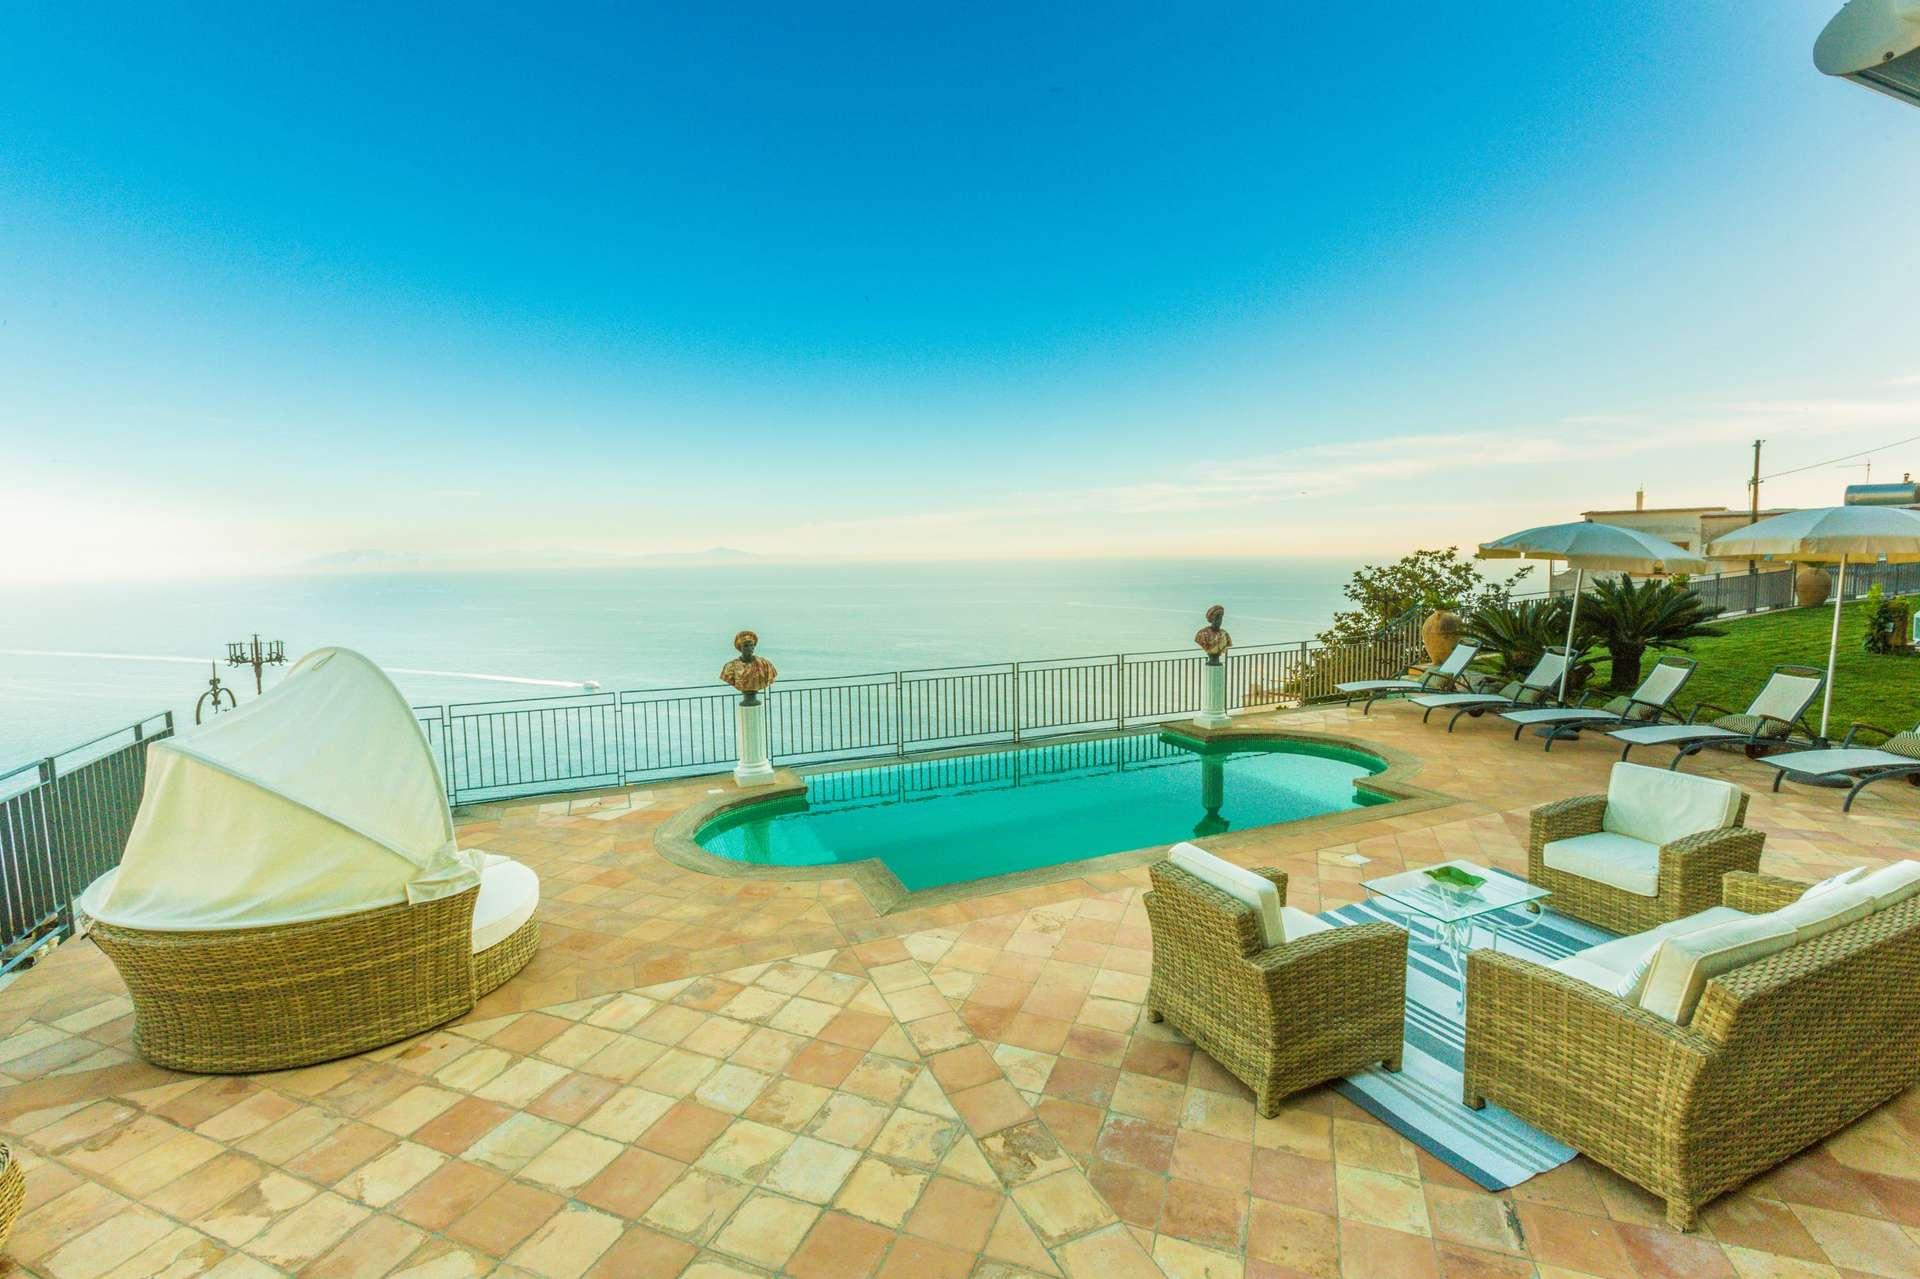 Luxury vacation rentals europe - Italy - Amalfi coast - Prai ano - Roxy - Image 1/18